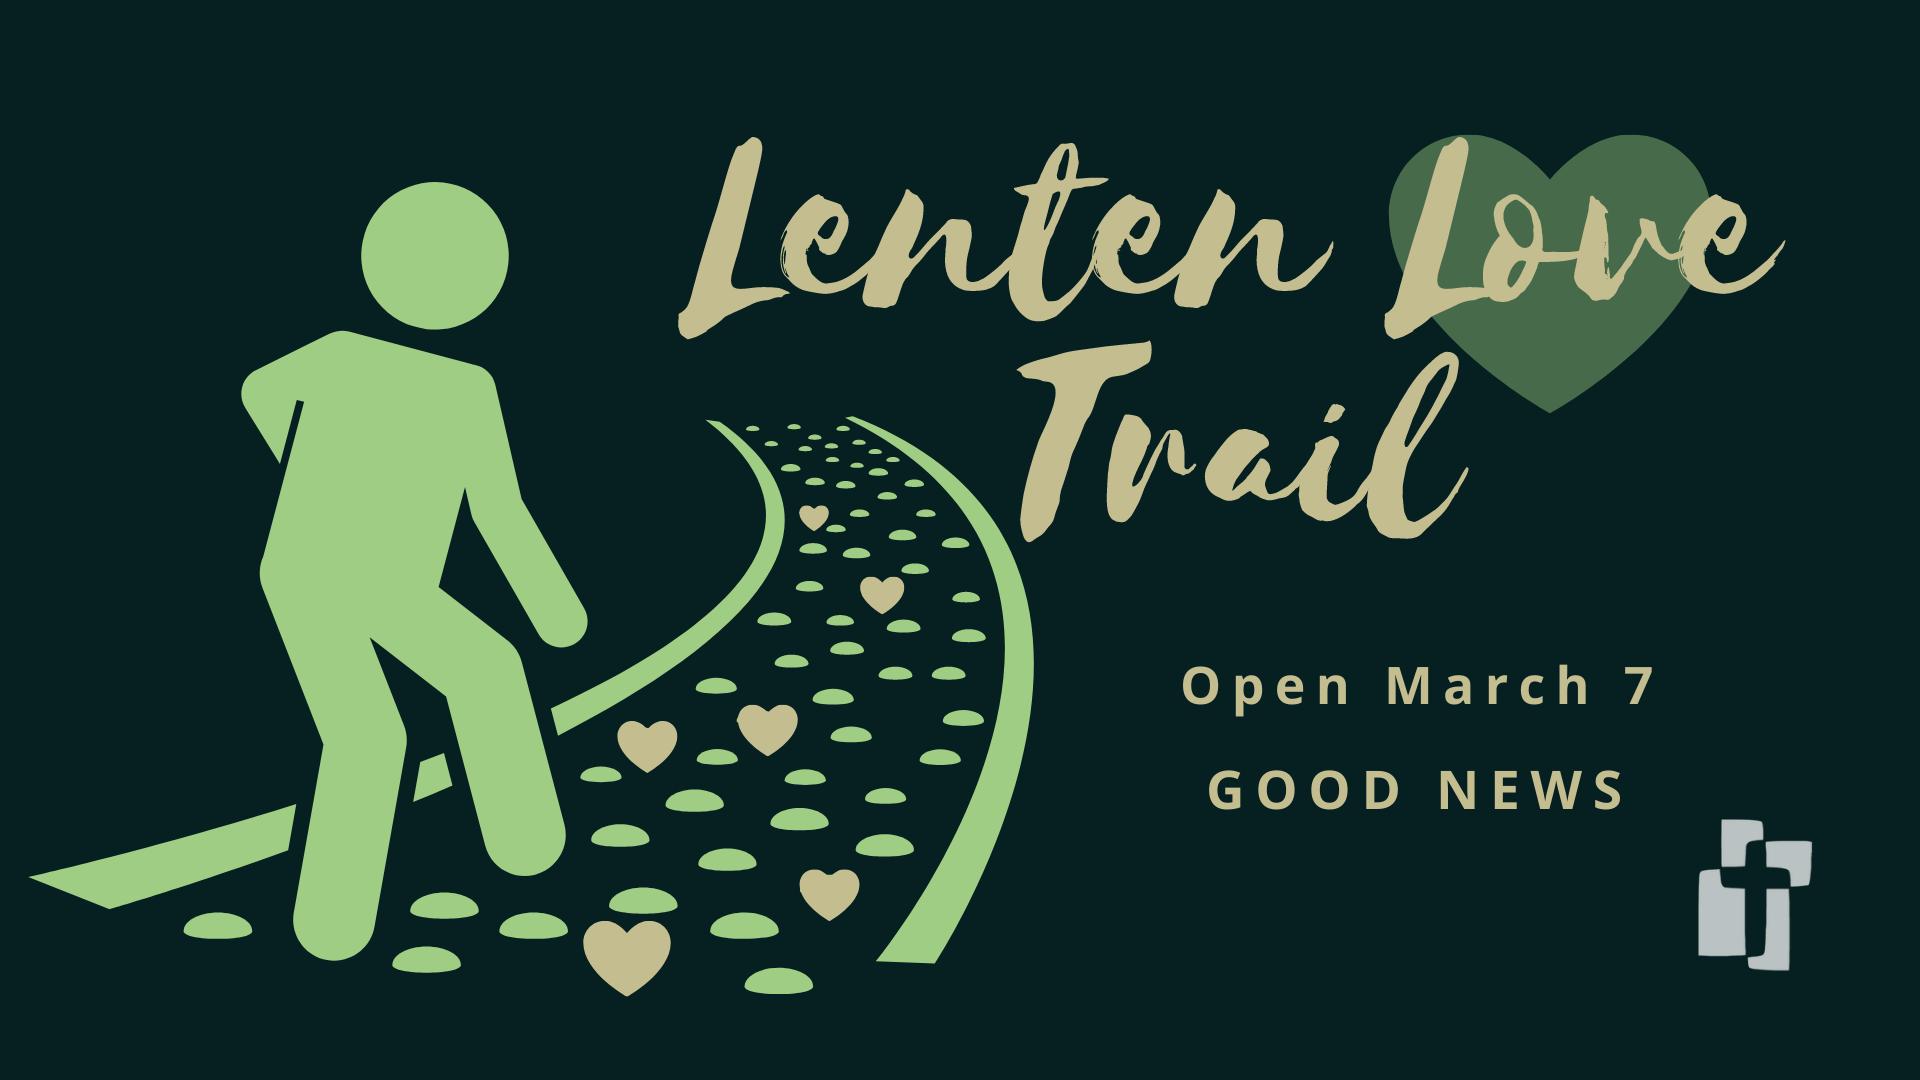 Lenten Love Trail